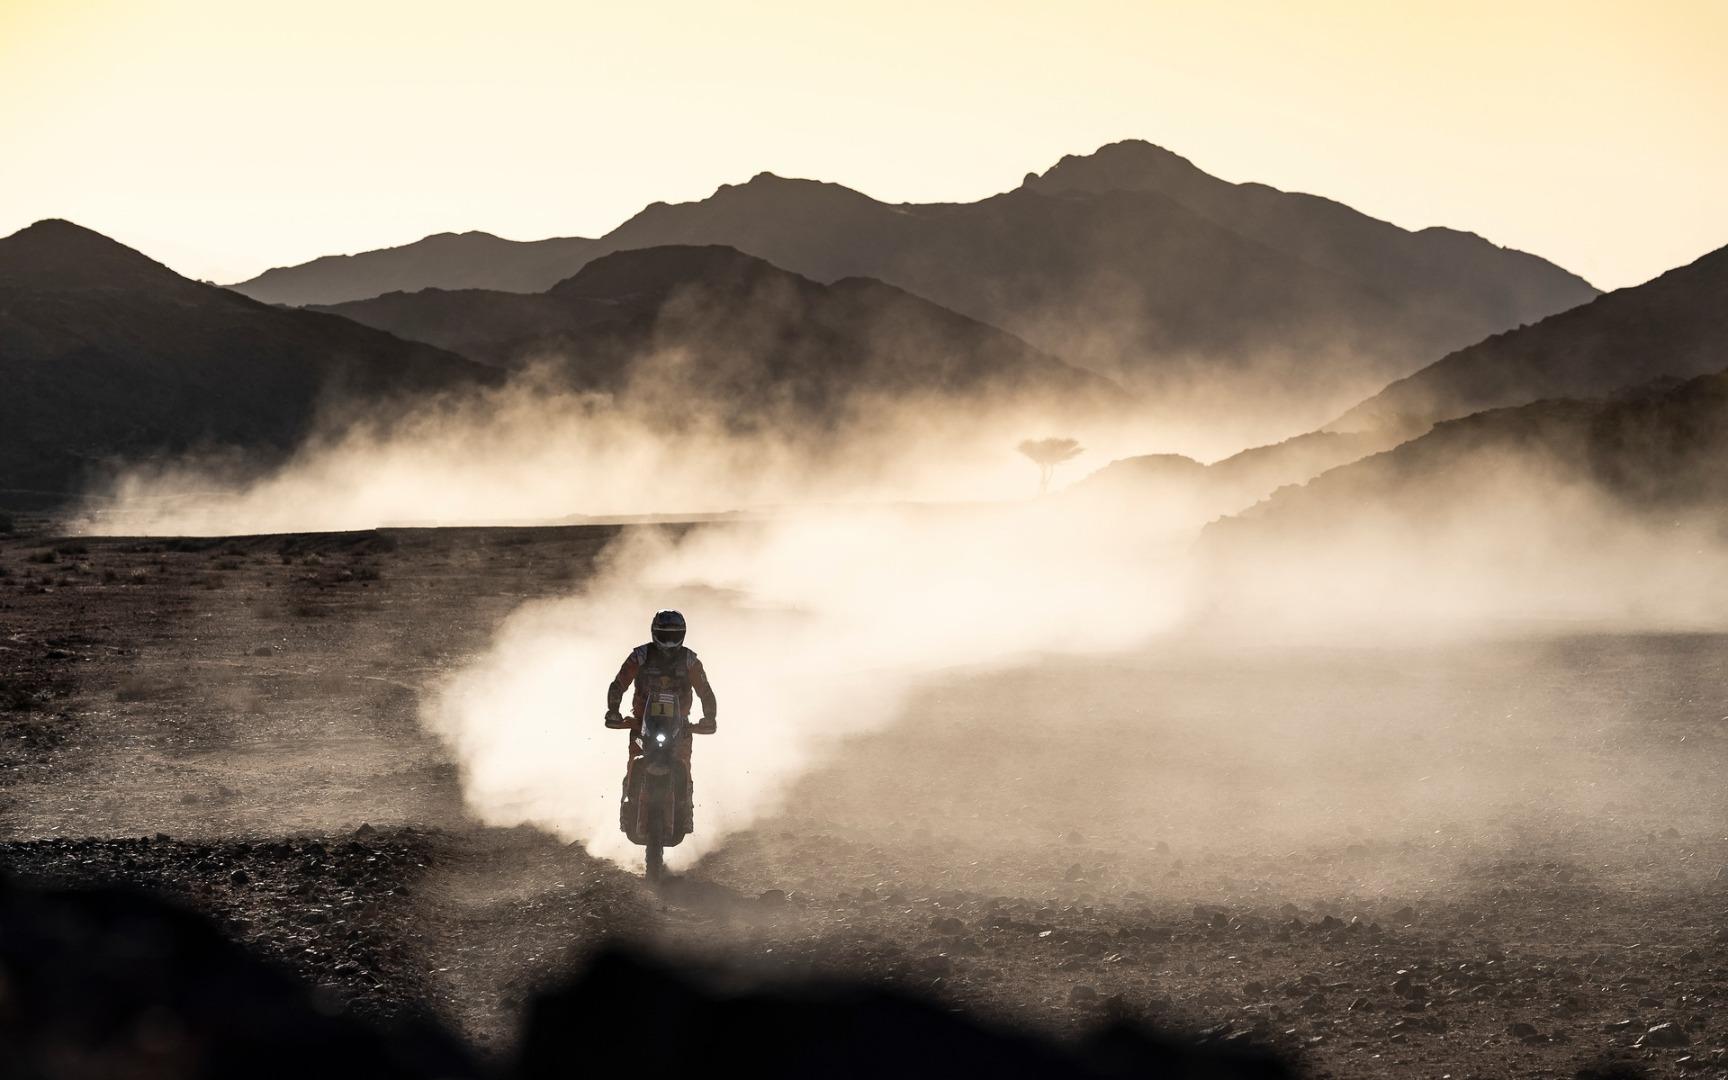 Toby Price, KTM, Etapa 2, Dakar 2020